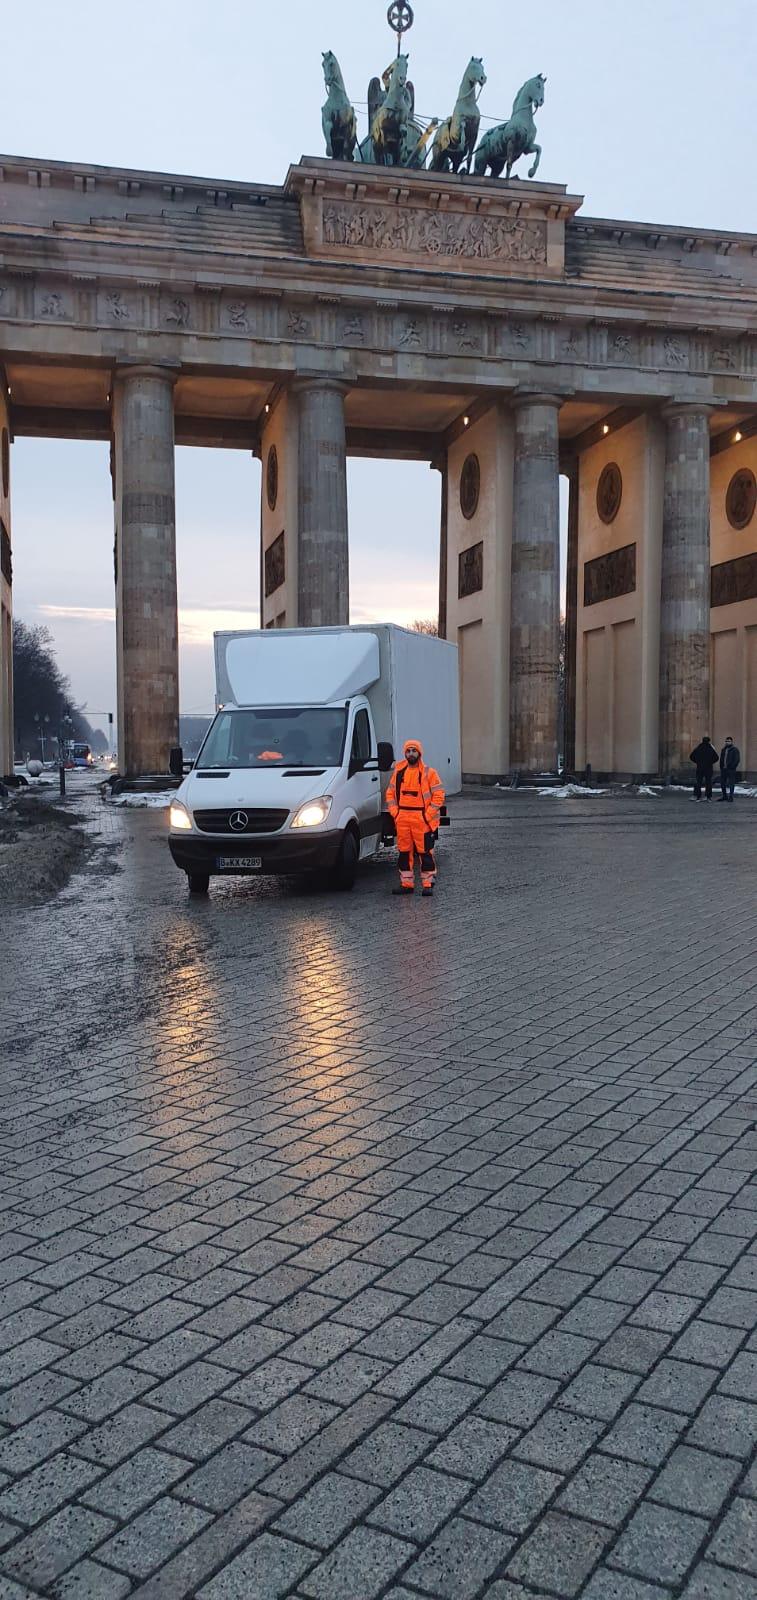 Sperrmüllabholung Berlin ♻ Jetzt abholen & entsorgen lassen!